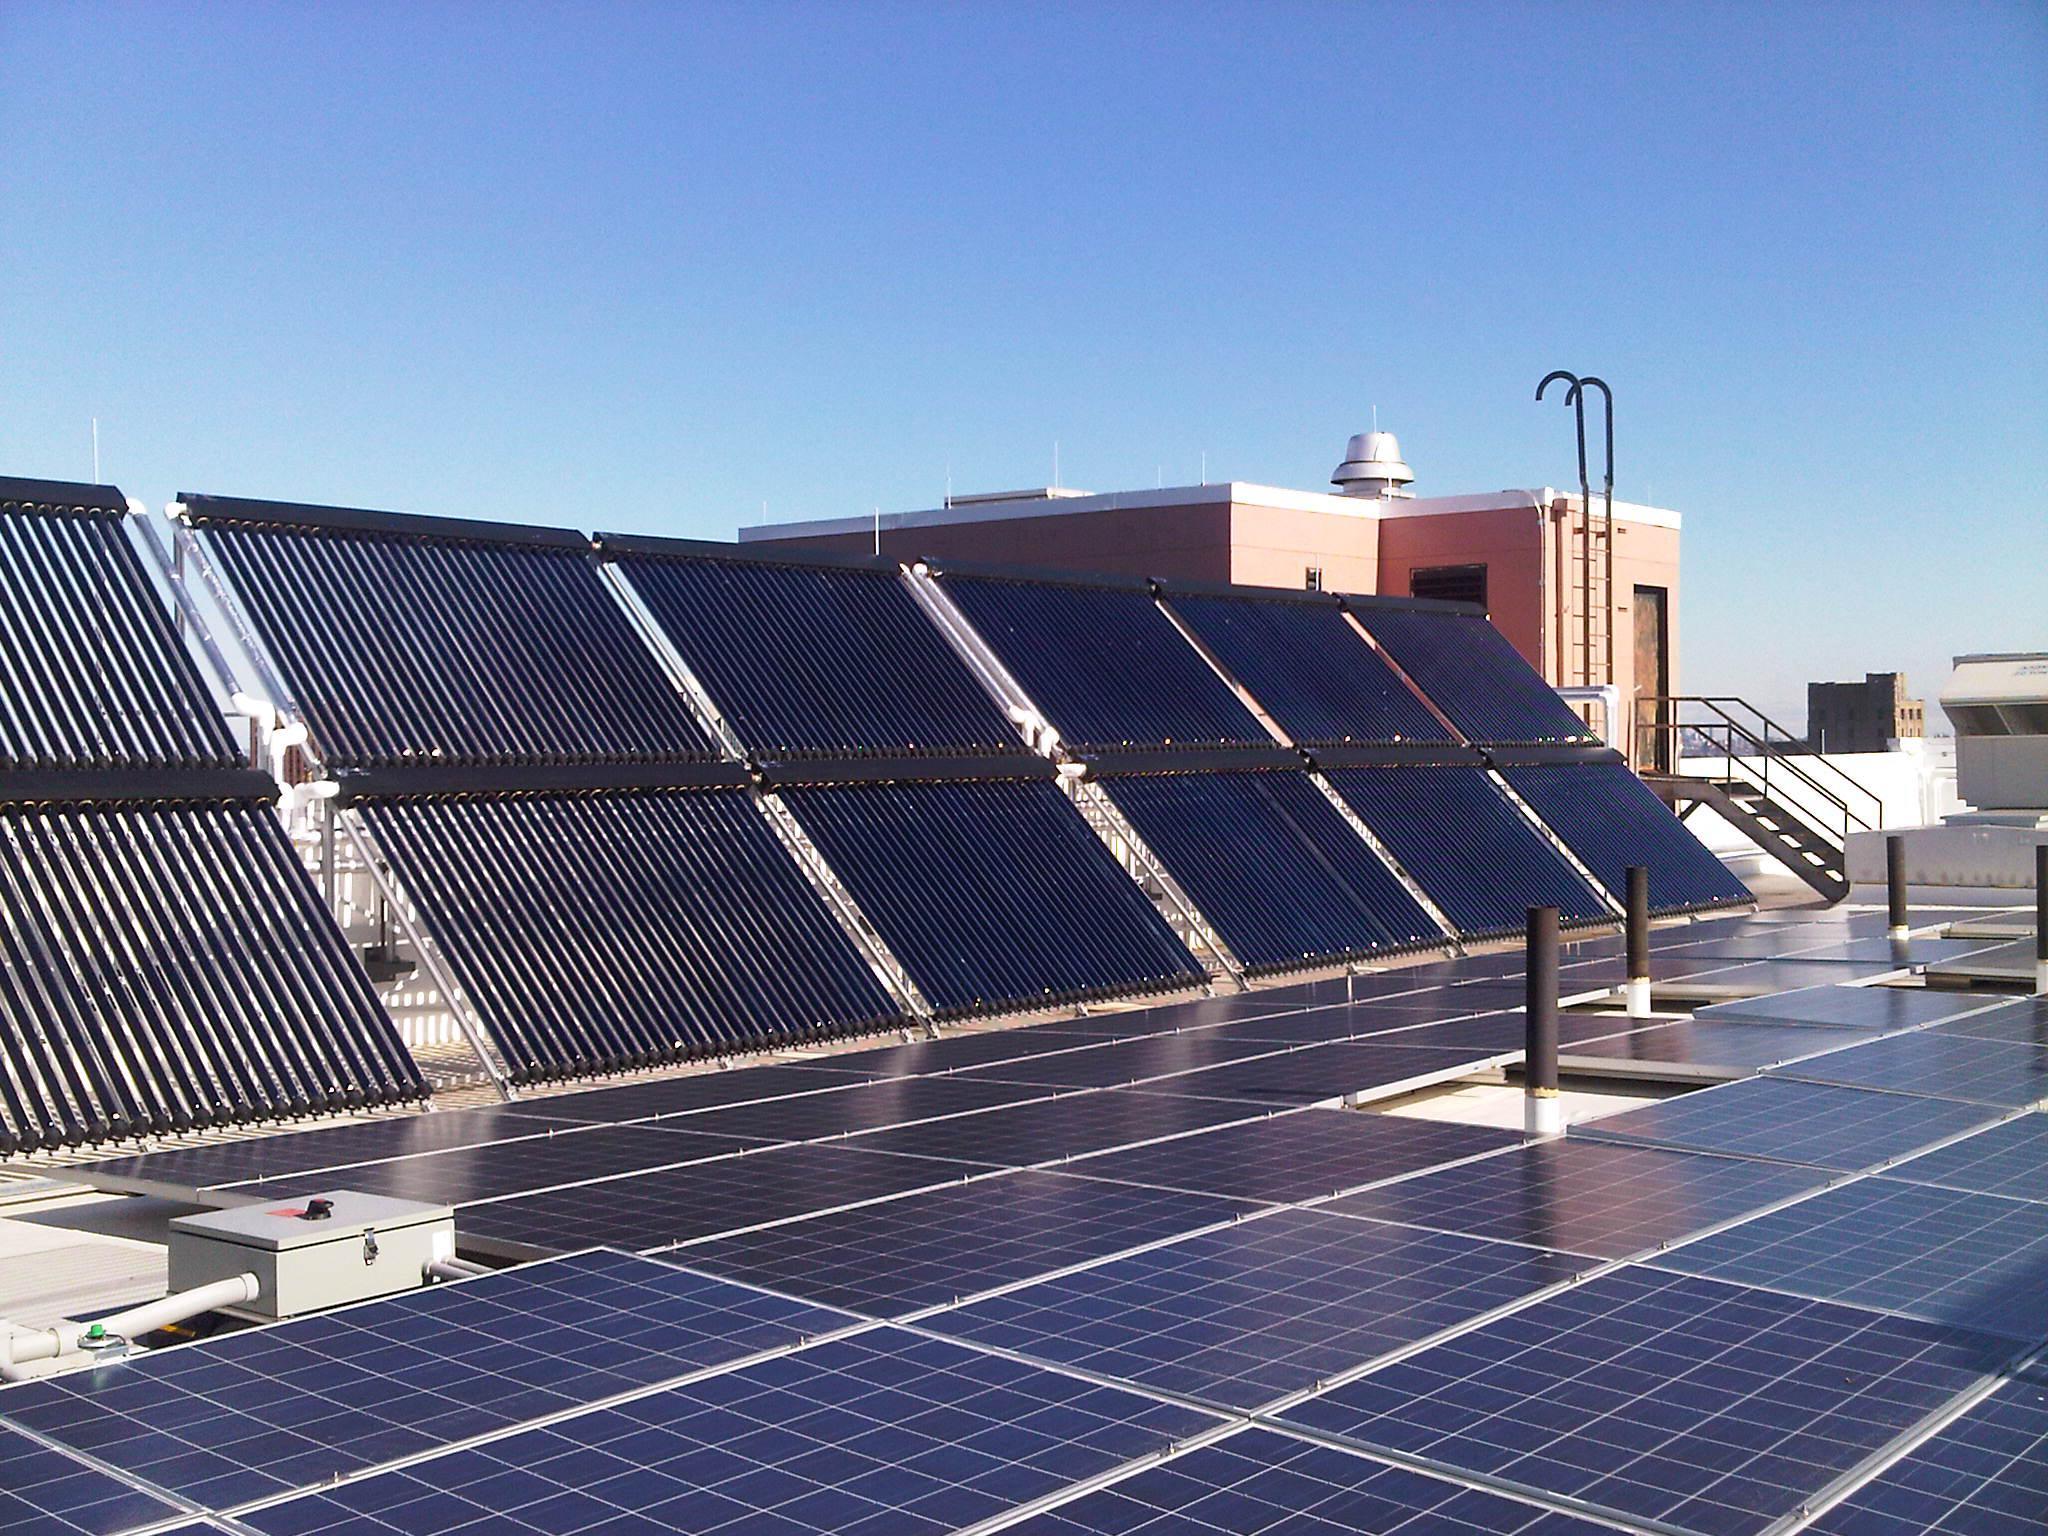 NJIT solar array